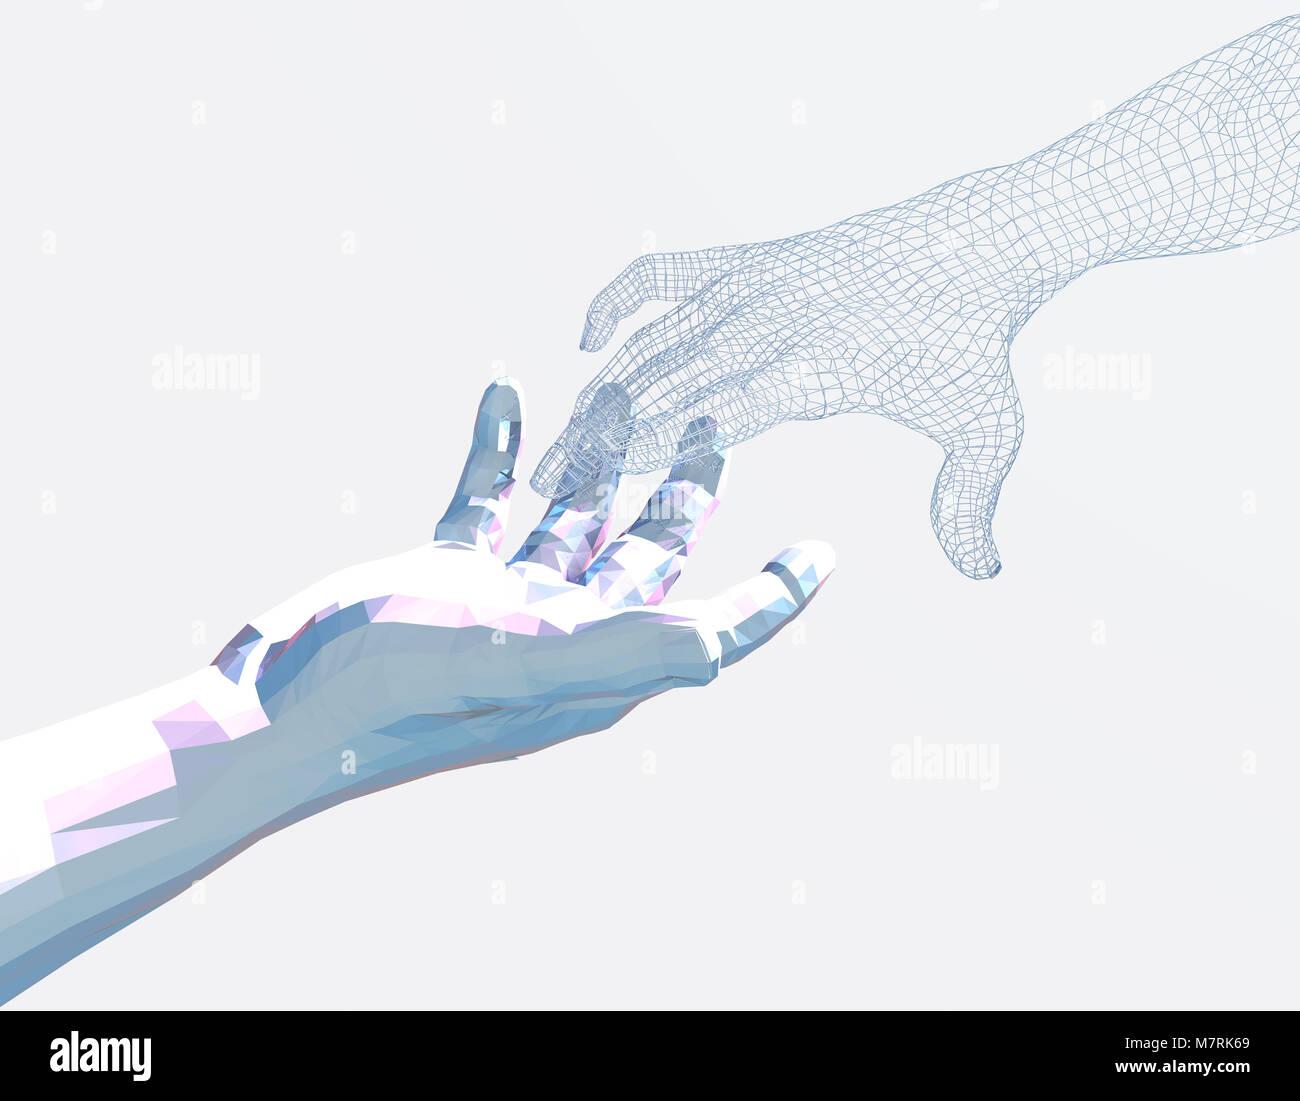 Intelligente tecnologia umana comunicazione, trasmissione dati e comunicazione intelligente Immagini Stock